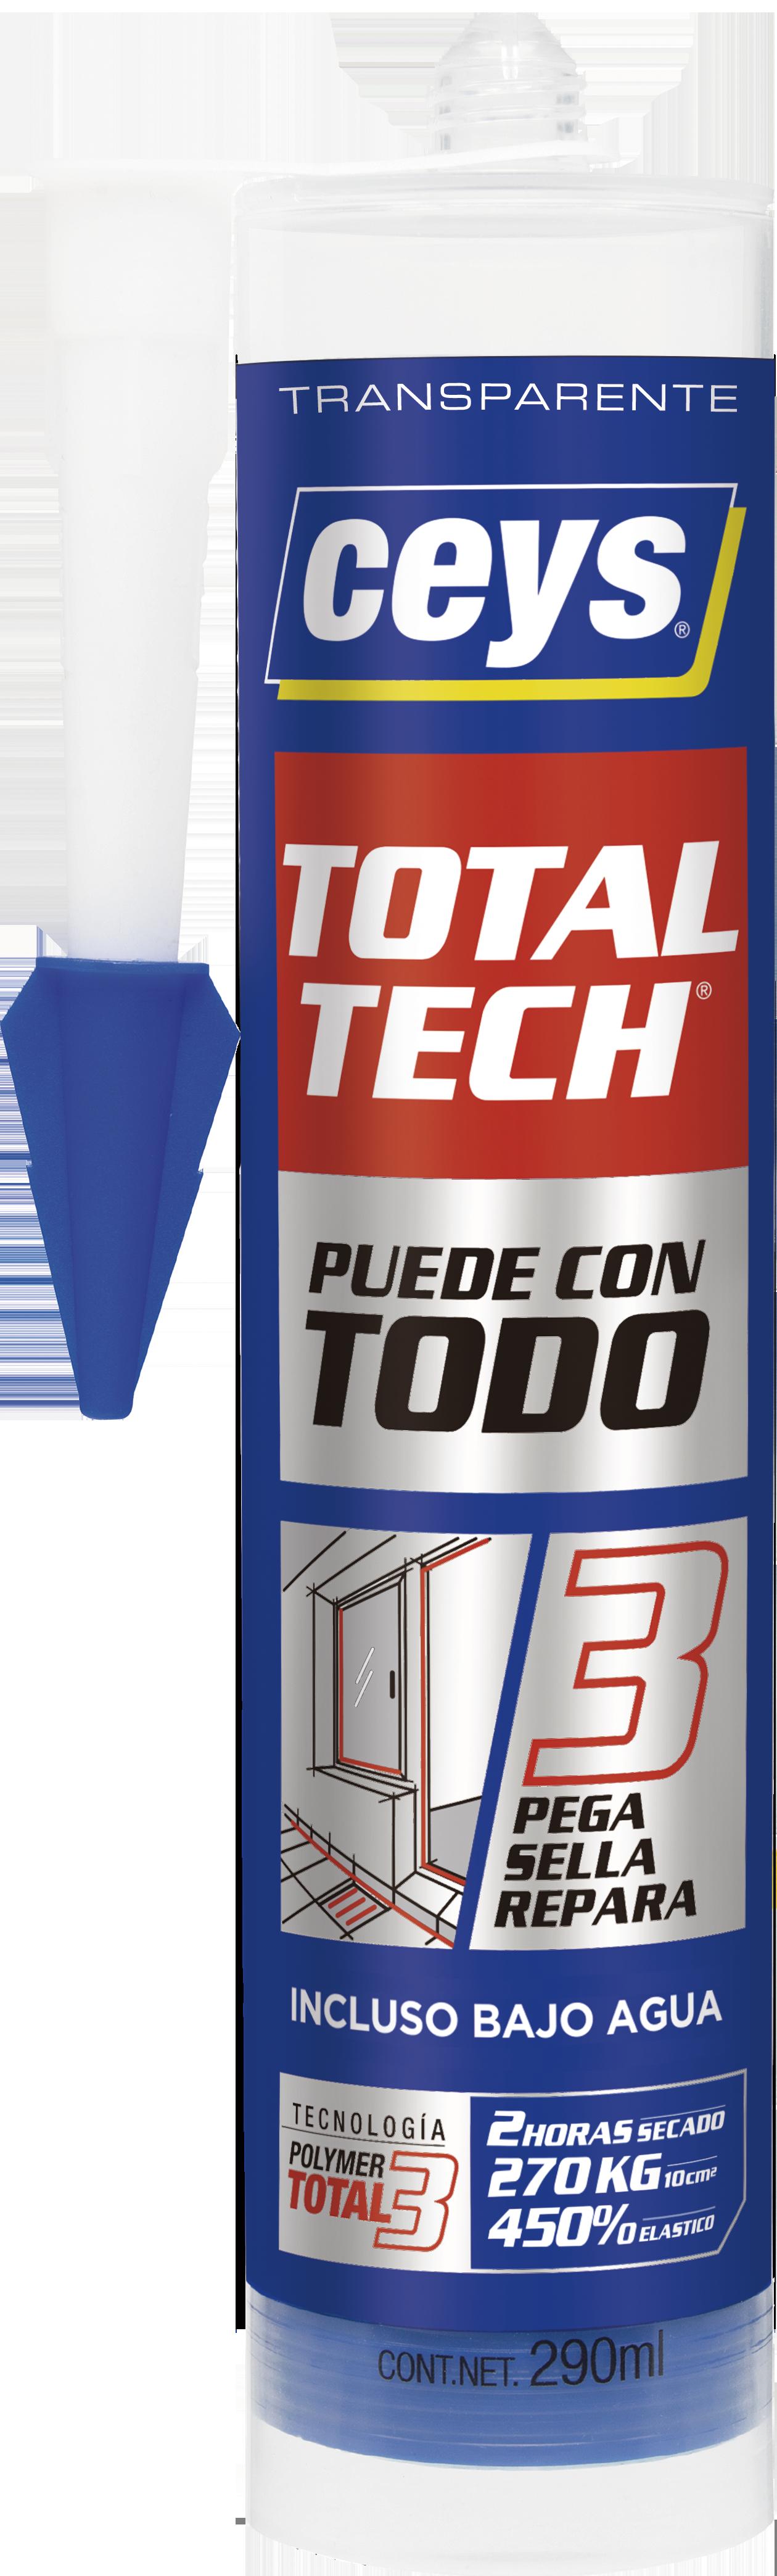 CEYS-TRI-ACTION-TOTAL-TECH-20G